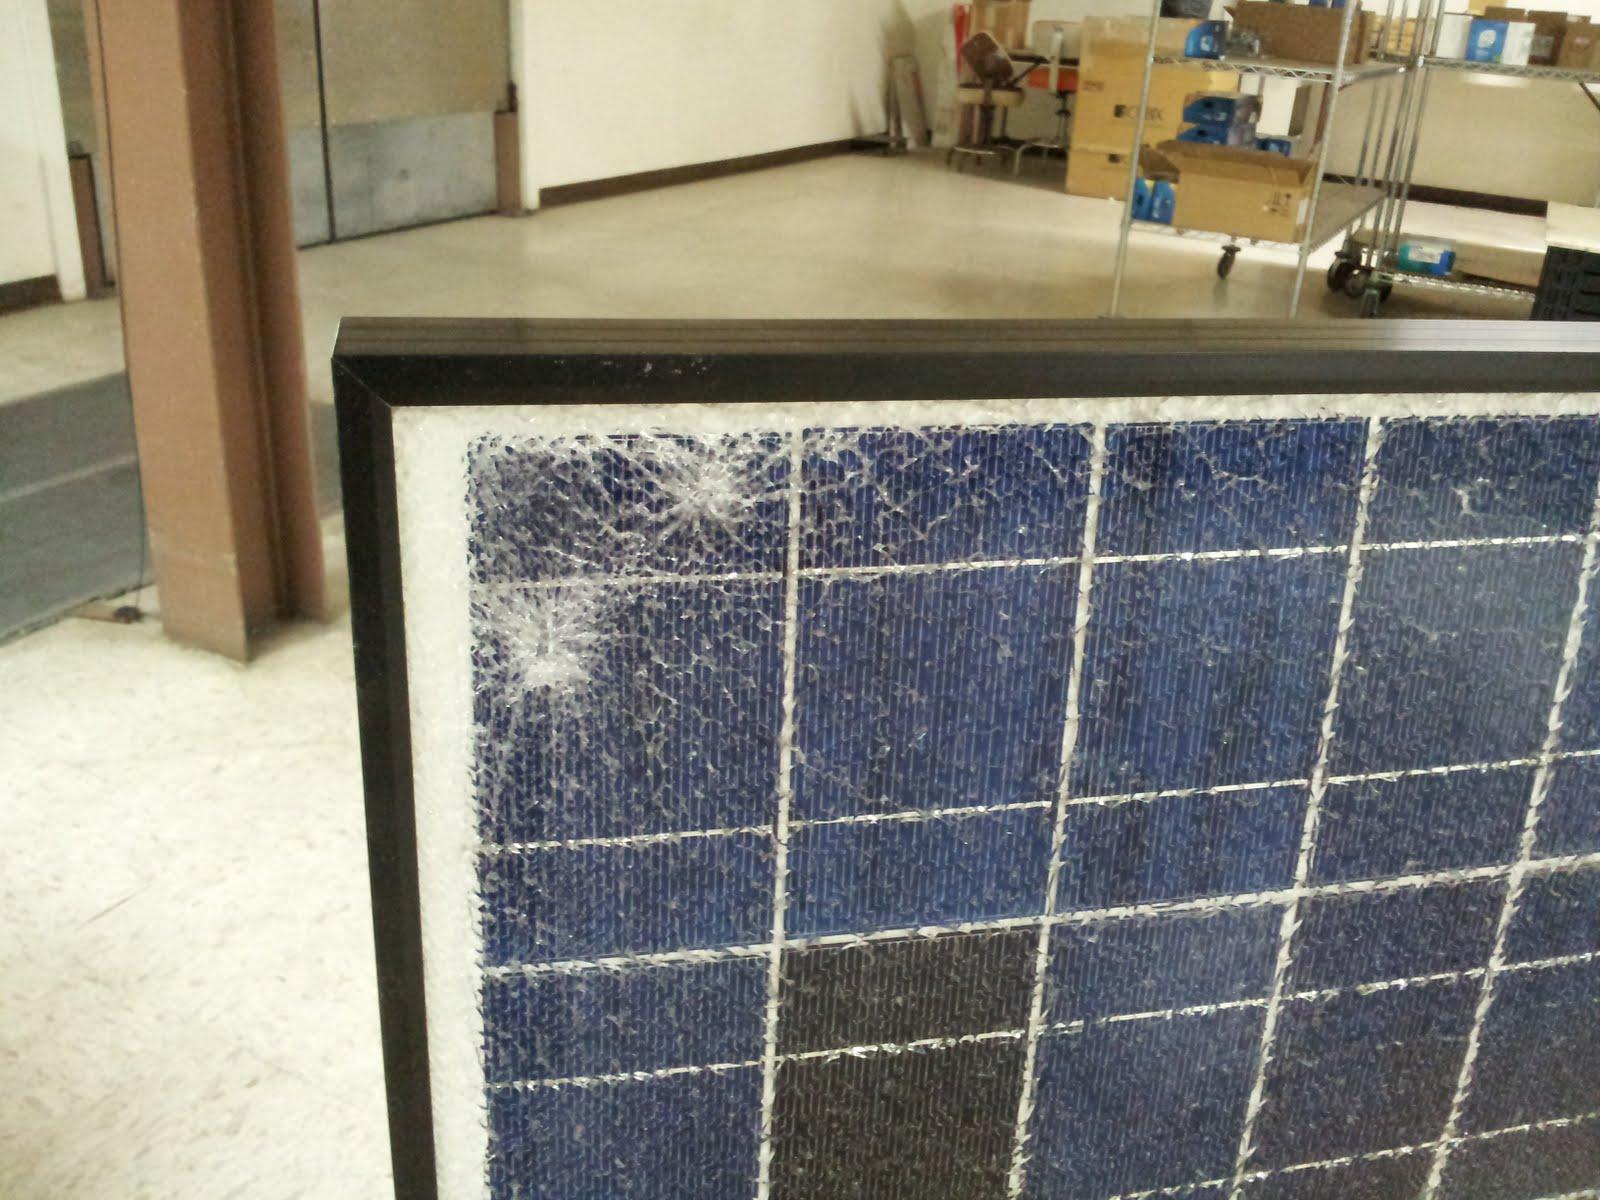 An Old Technician S Work Bench Broken Solar Panel Part 1